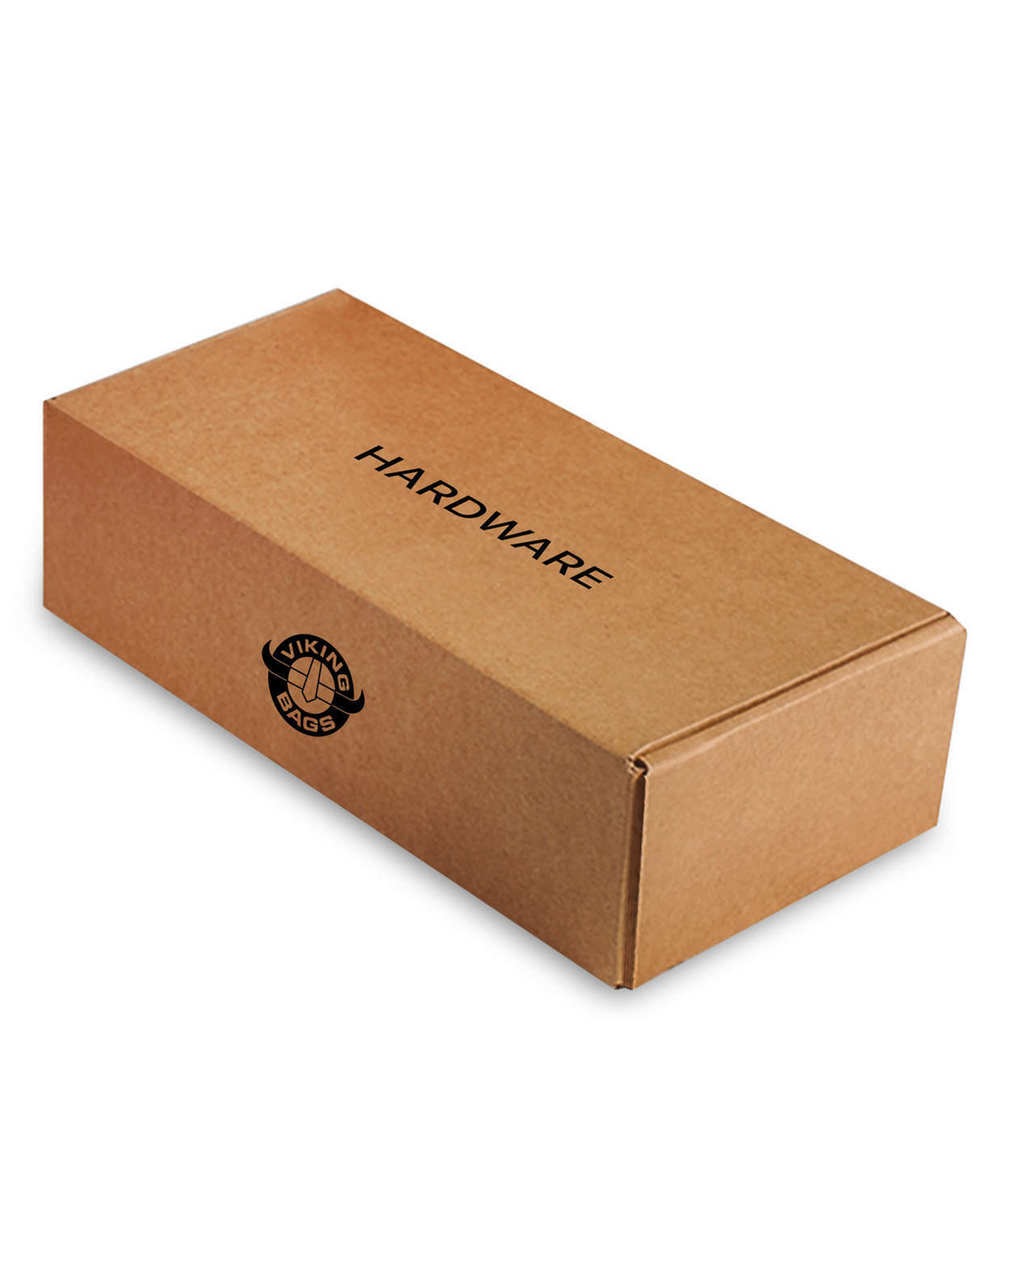 Honda VF750C Magna 750 Viking Lamellar Extra Large  Black Hard Saddlebags box